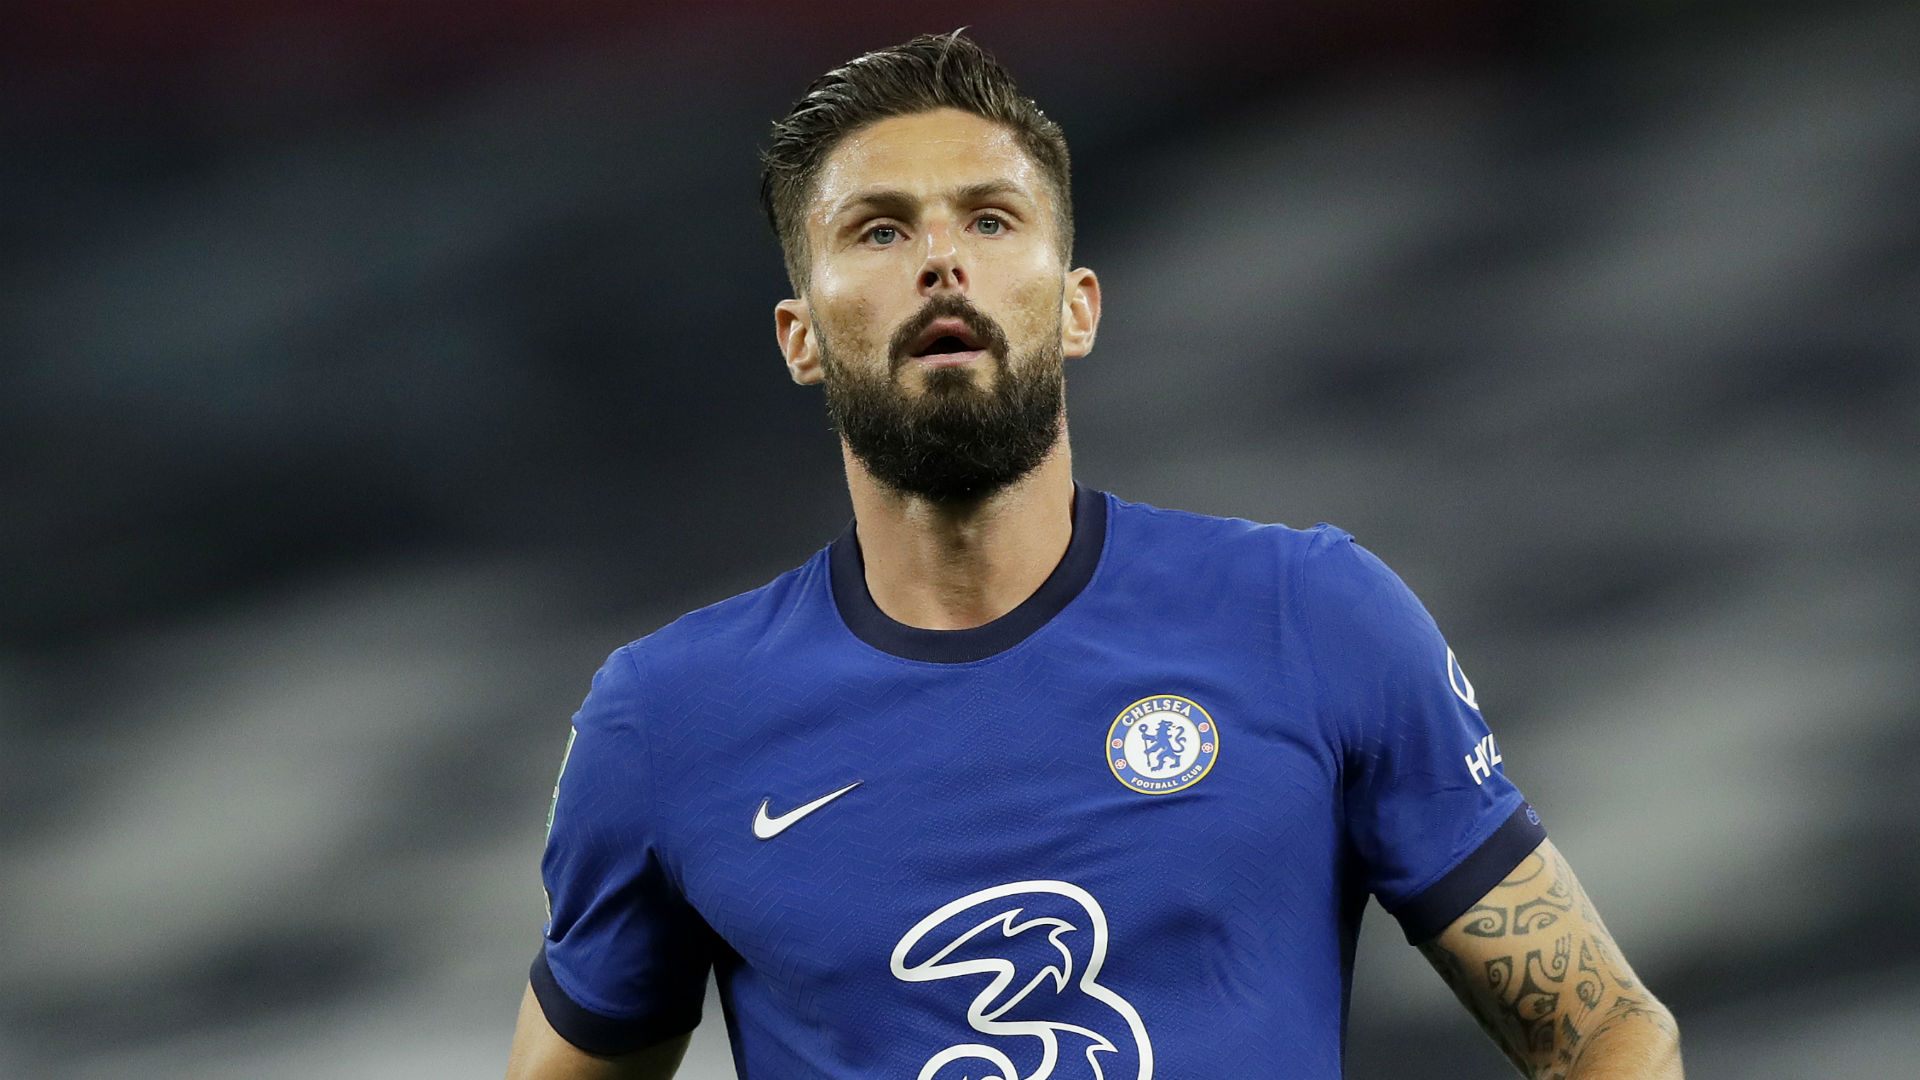 Chelsea v Aston Villa Live Commentary & Result, 28/12/2020, Premier League